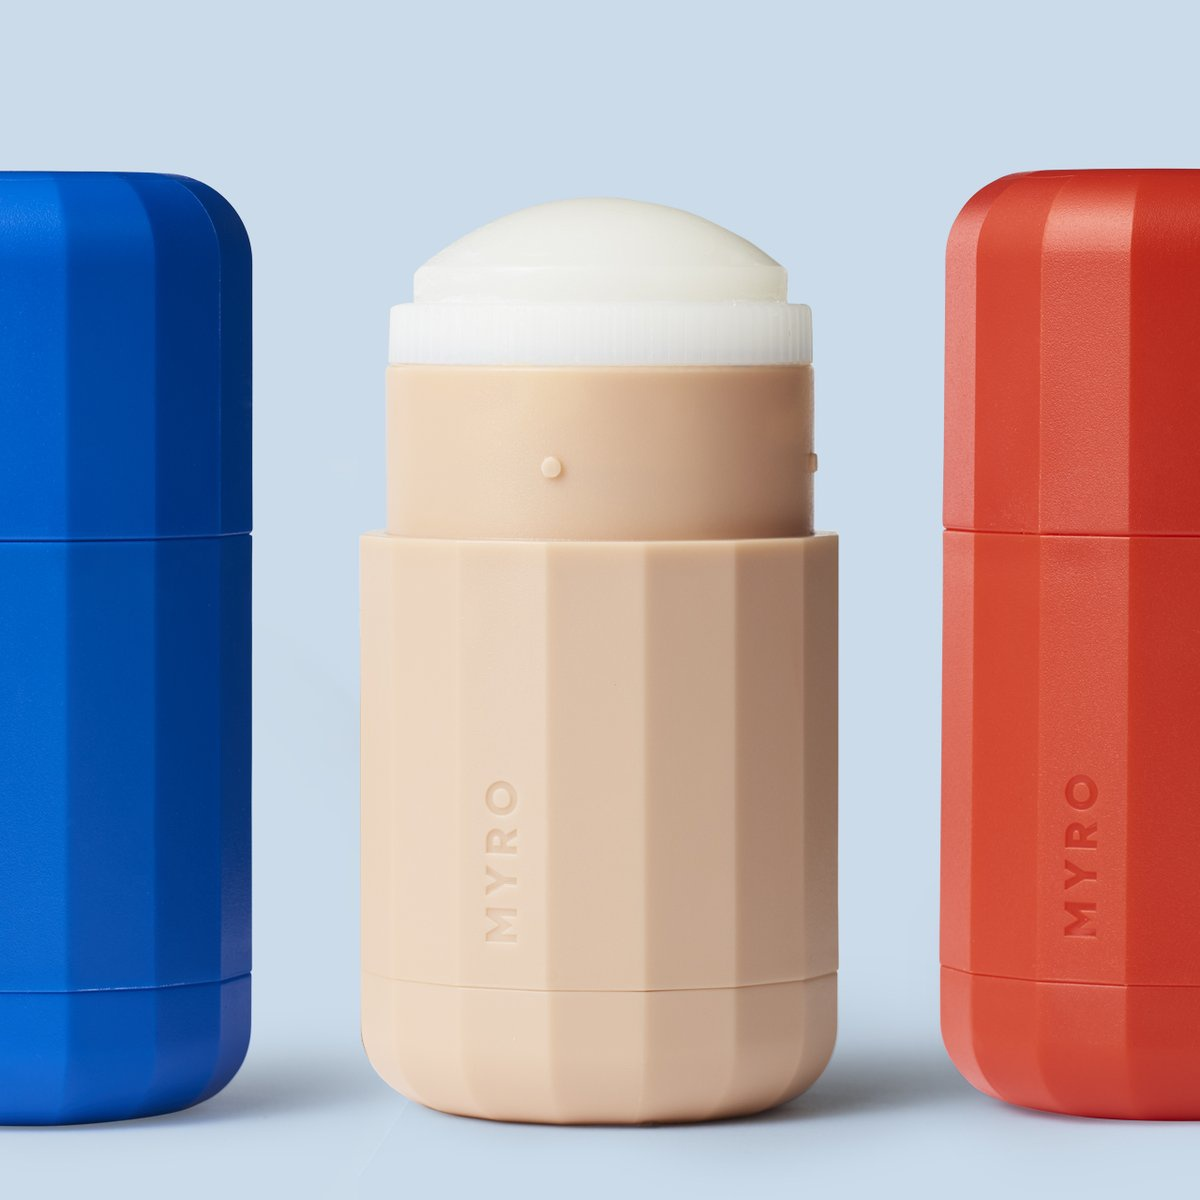 Myro Open Air Deodorant